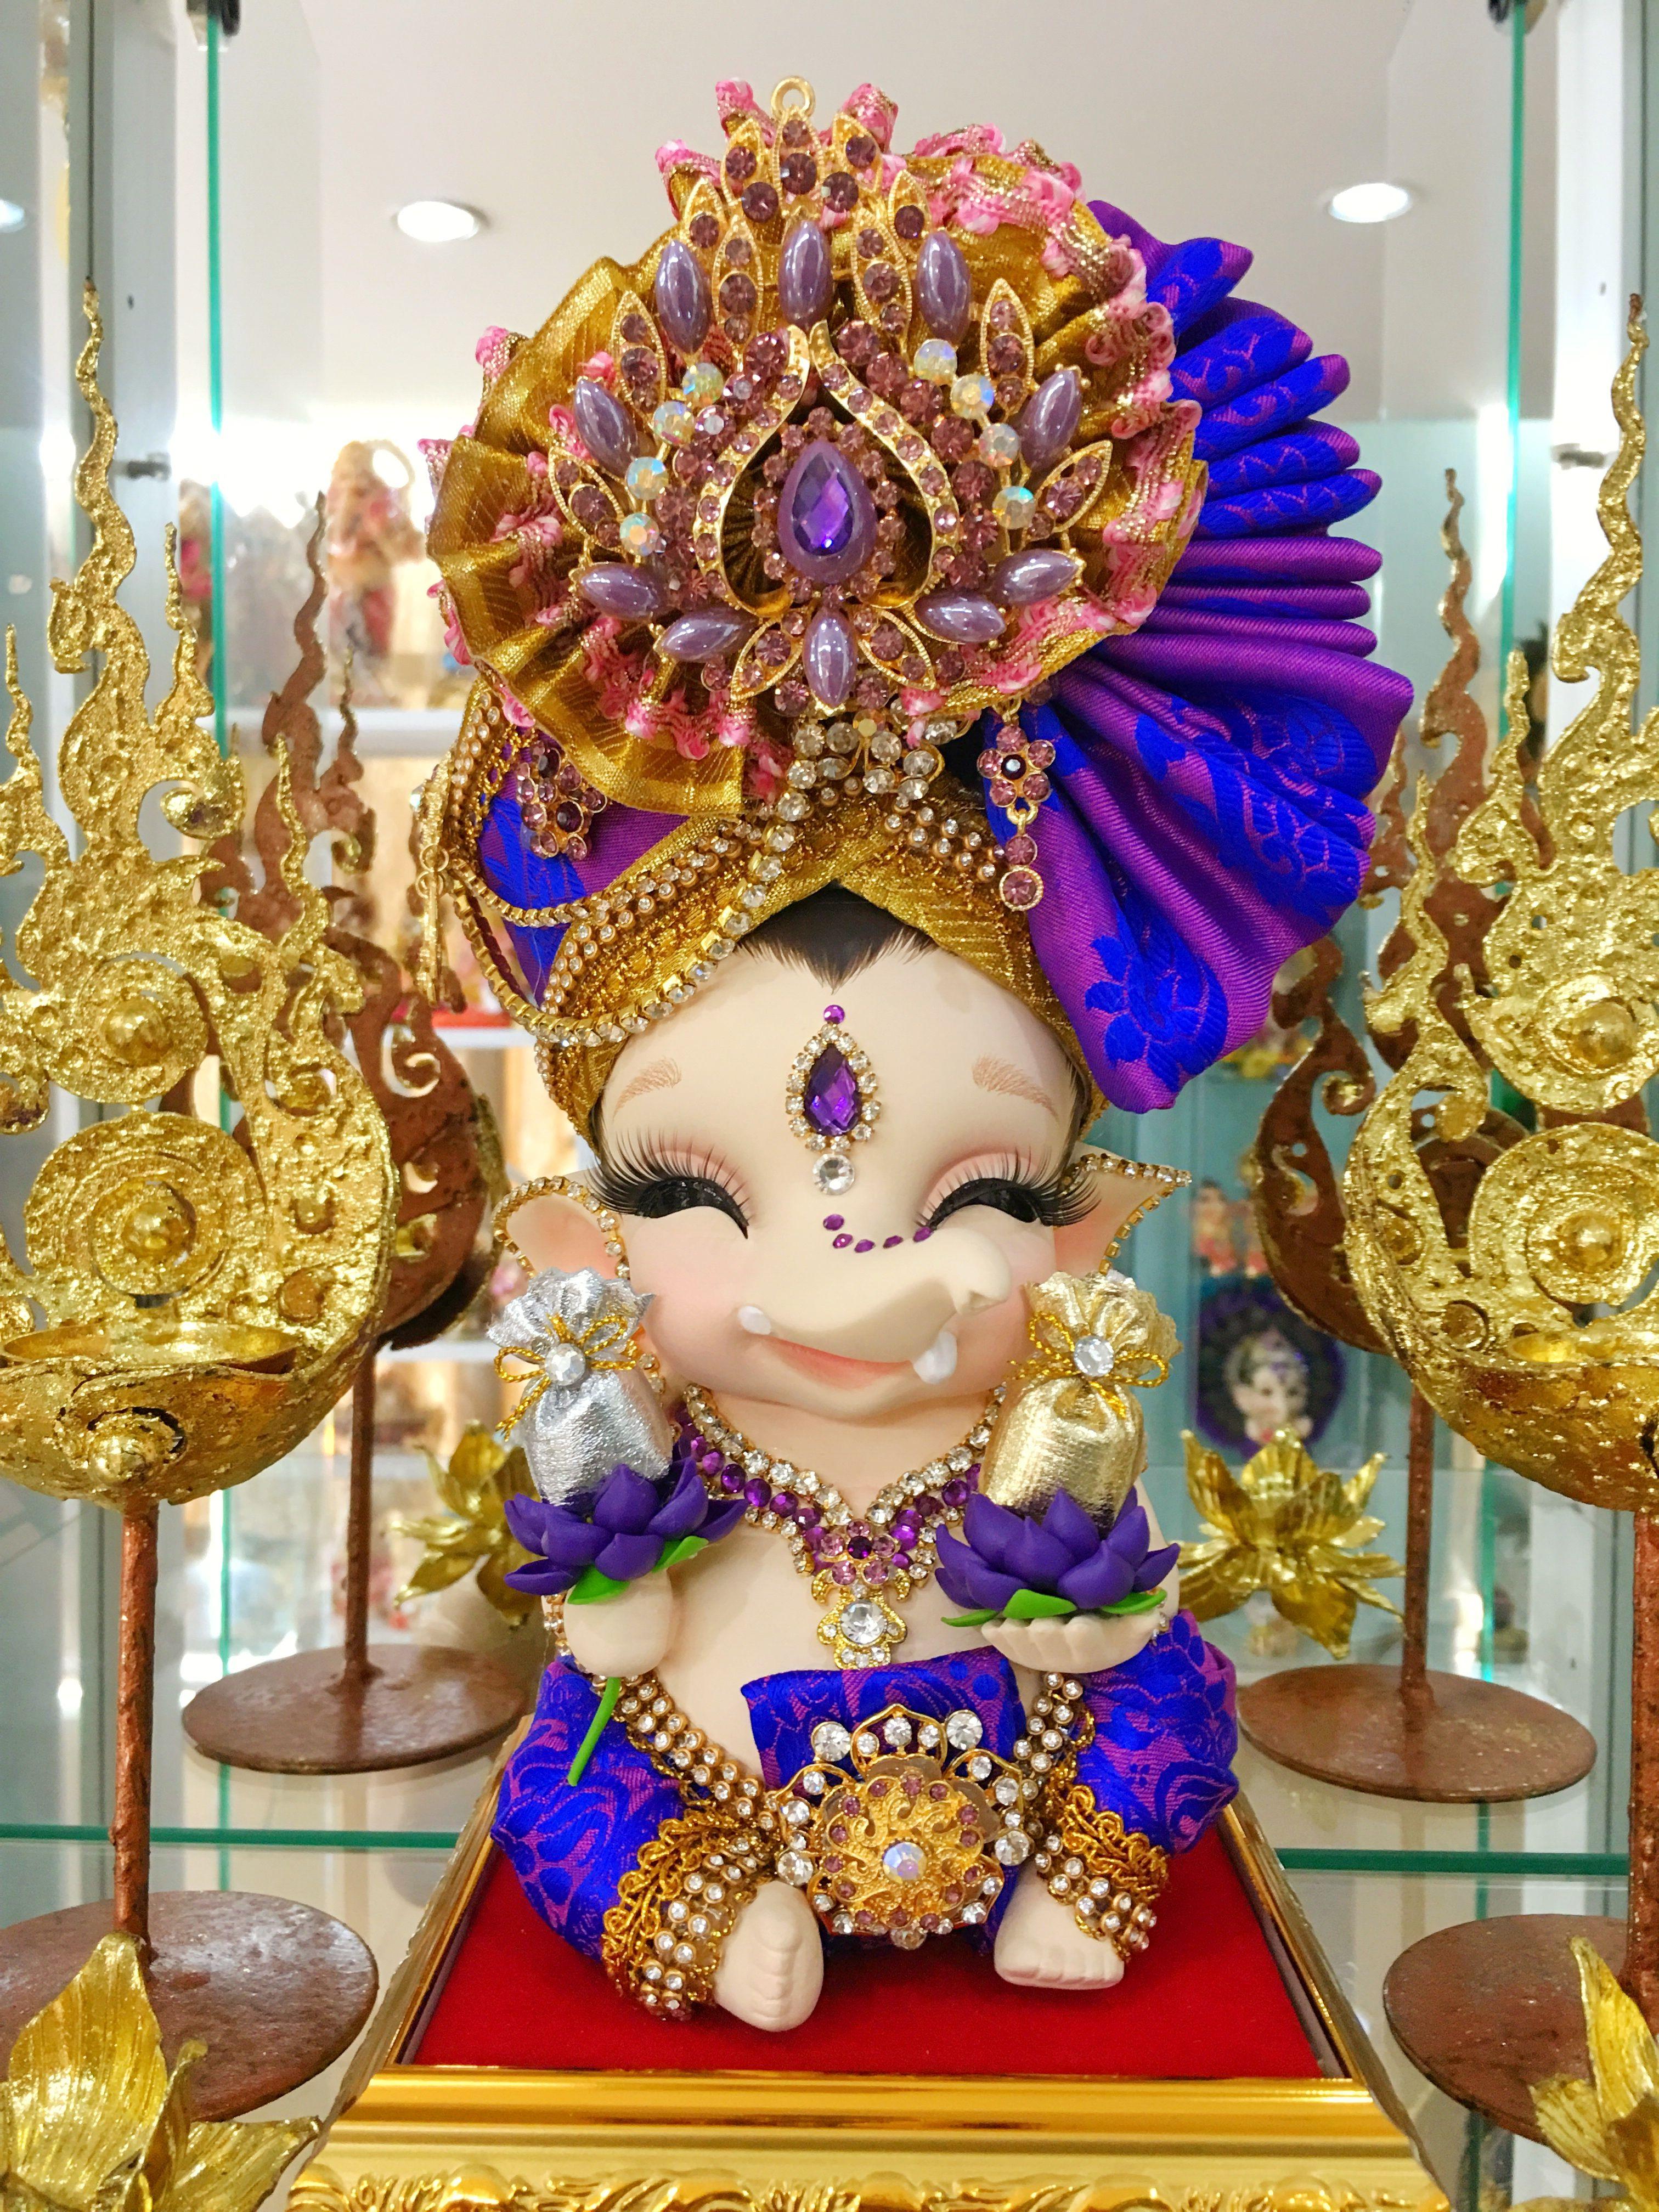 Pin By Anjana Devi Kumar Mht On Ganesh Baby Ganesha Happy Ganesh Chaturthi Images Ganesh Chaturthi Images